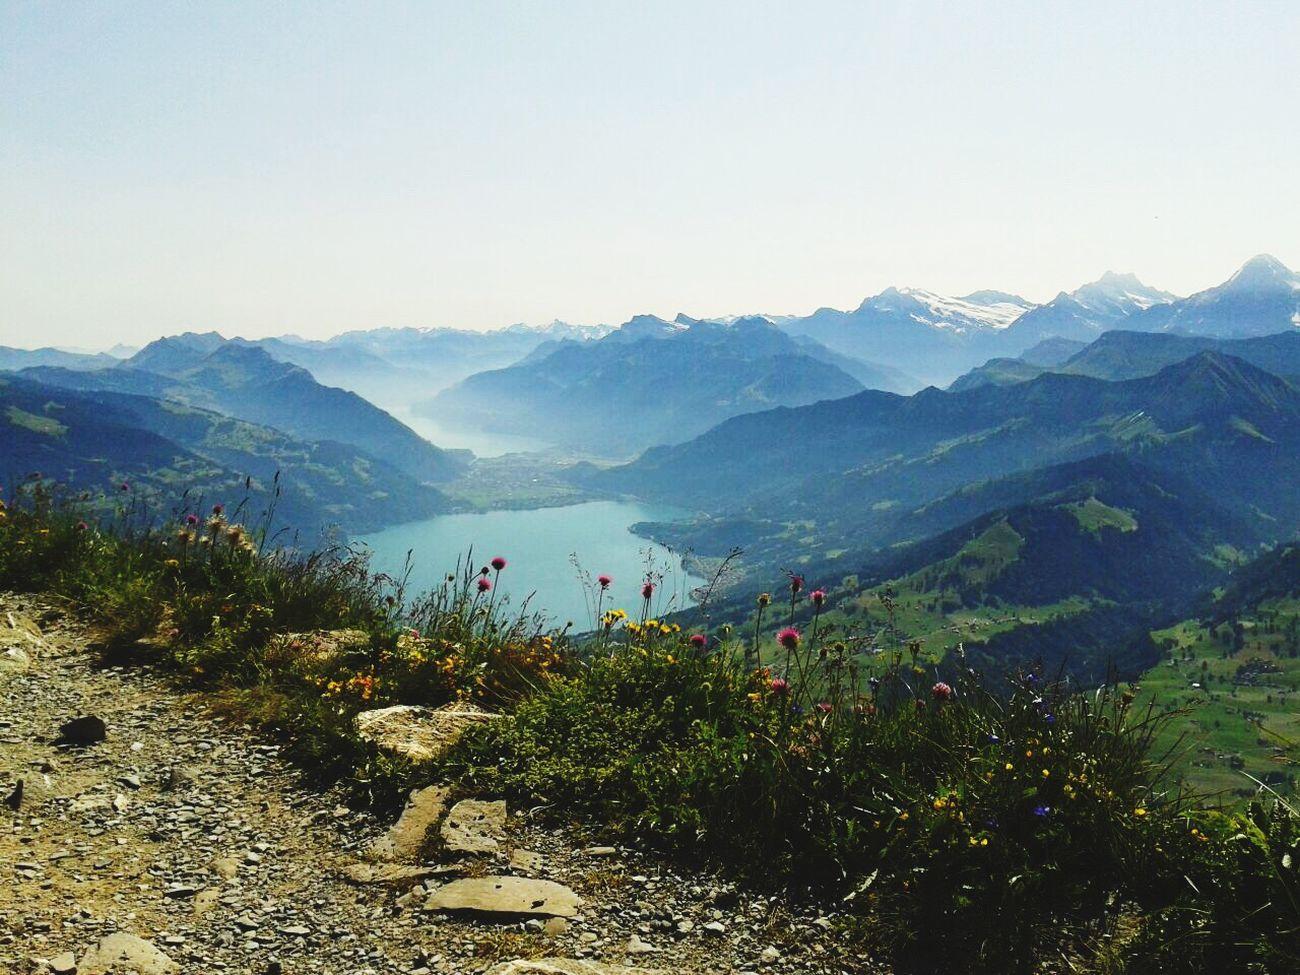 Beautiful stock photos of sonnenschein, mountain, water, scenics, tranquil scene